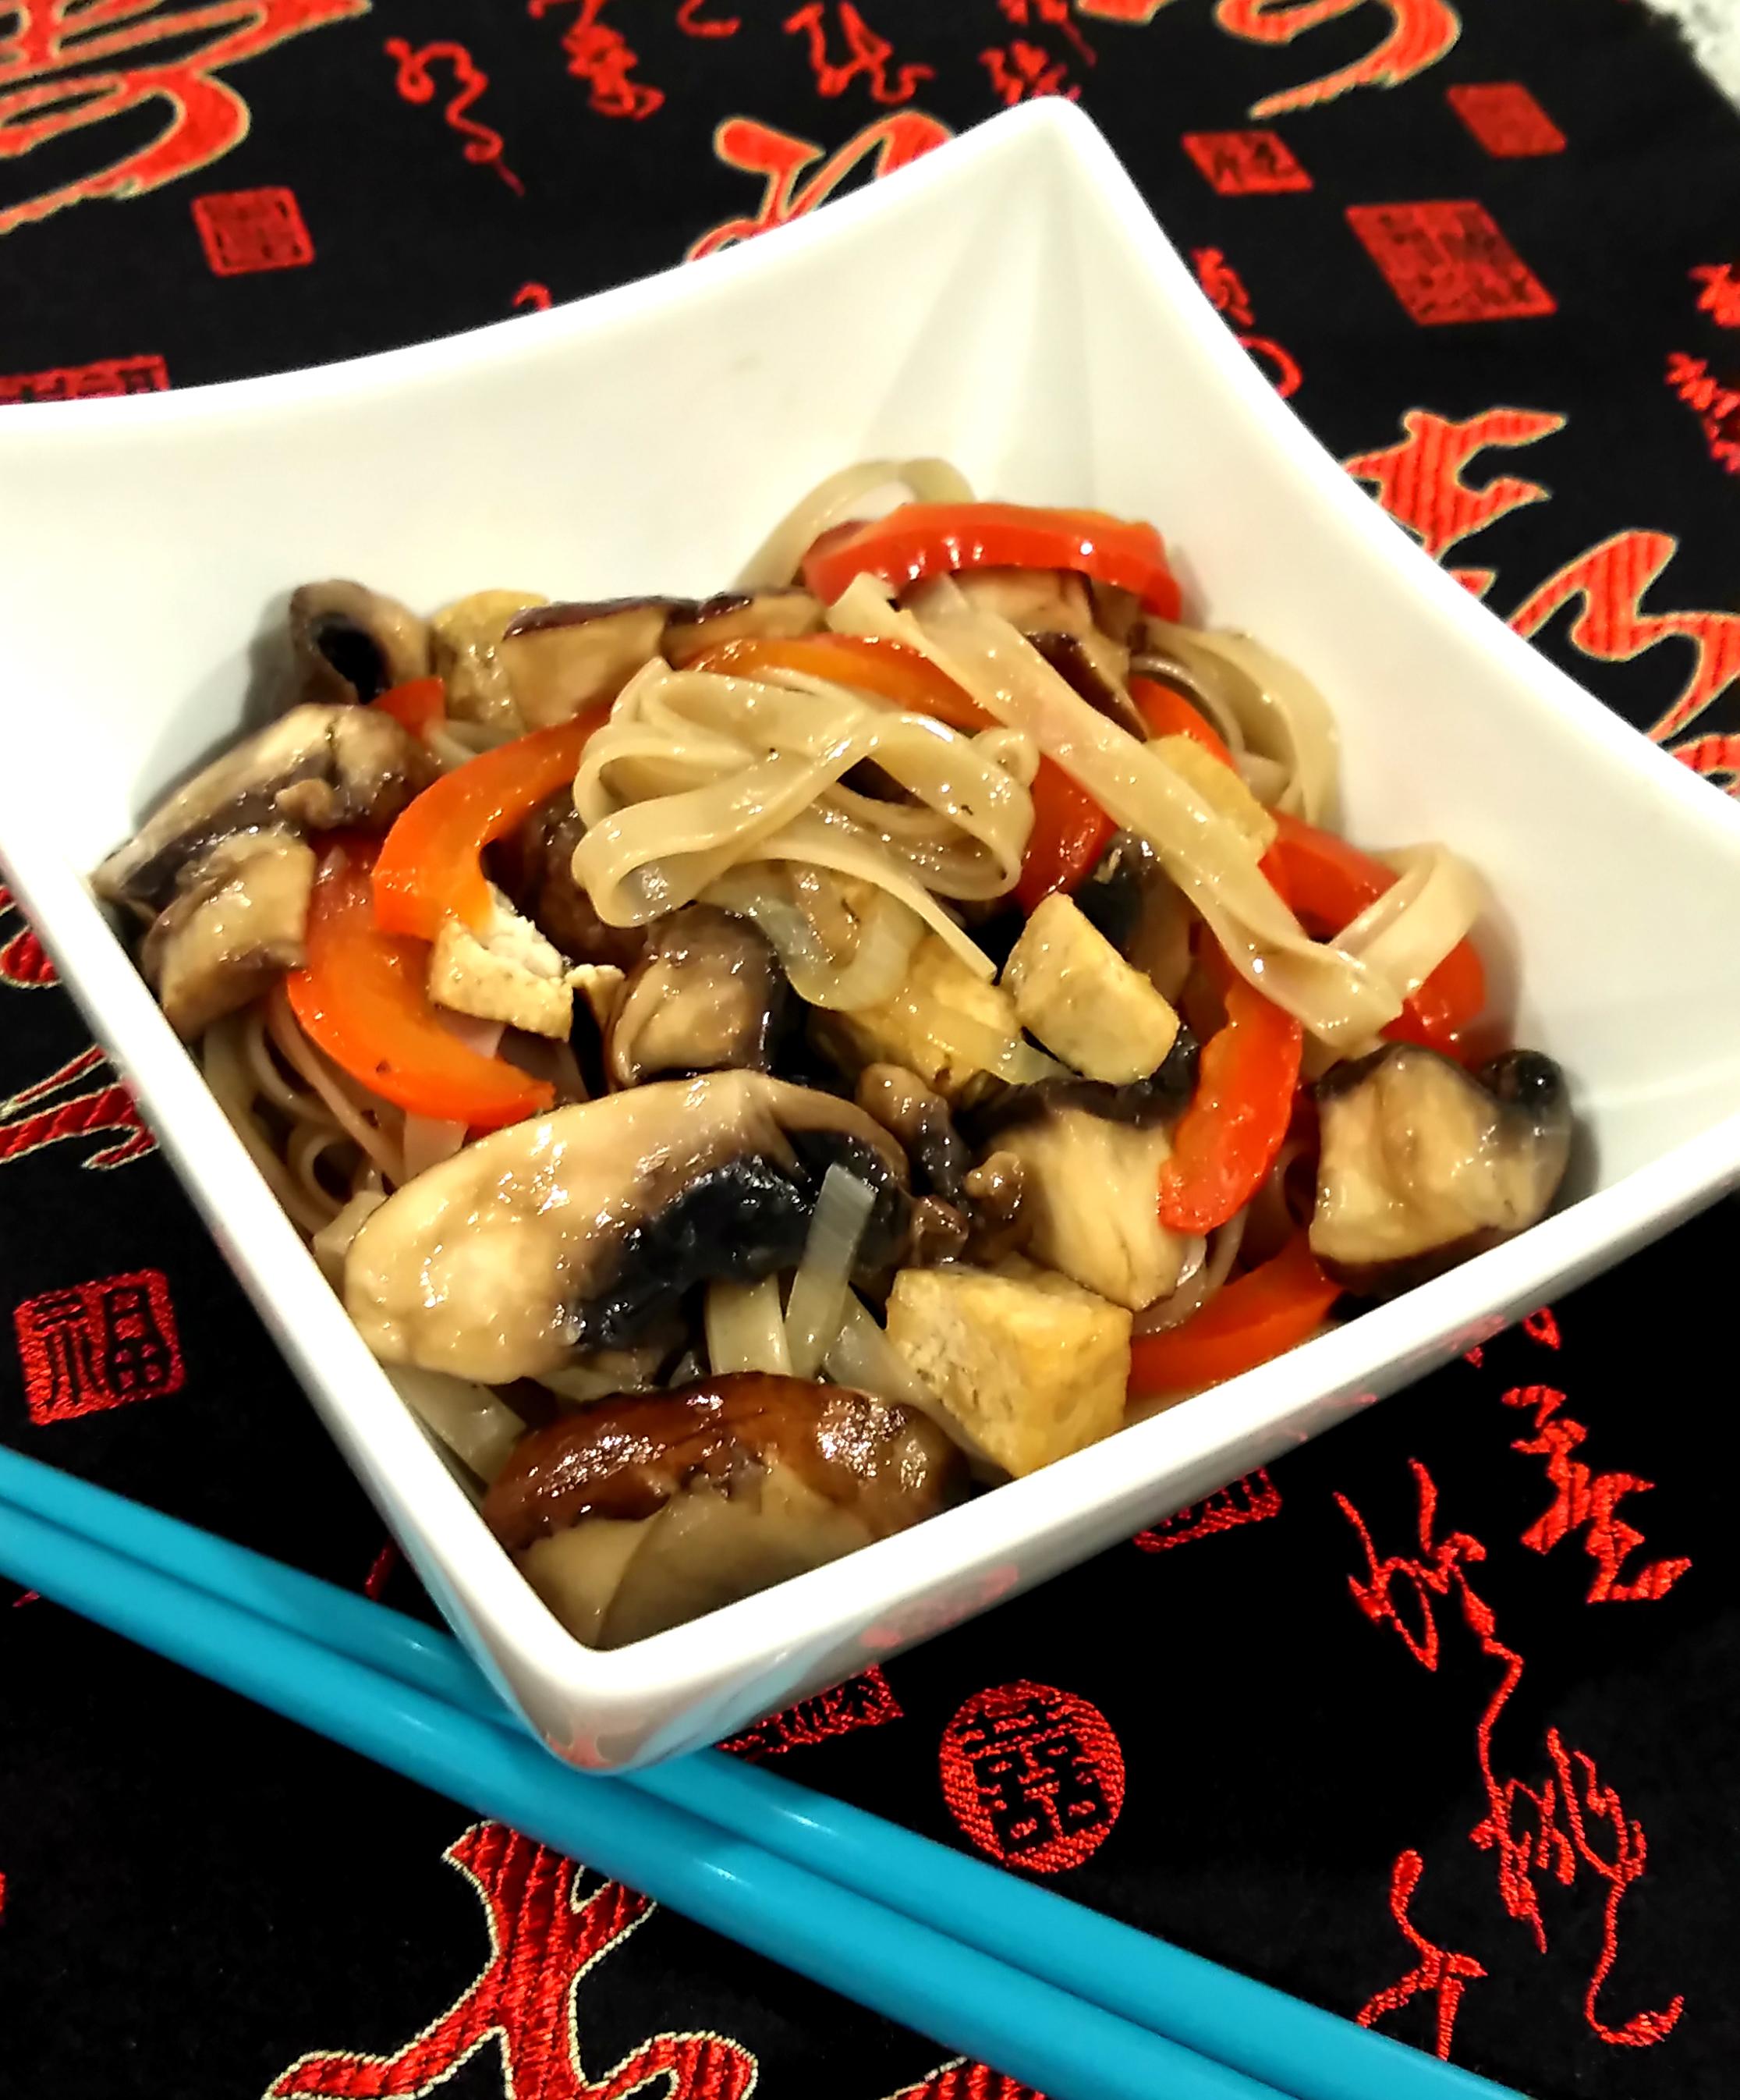 Mushroom, Tofu, and Noodle Stir-Fry